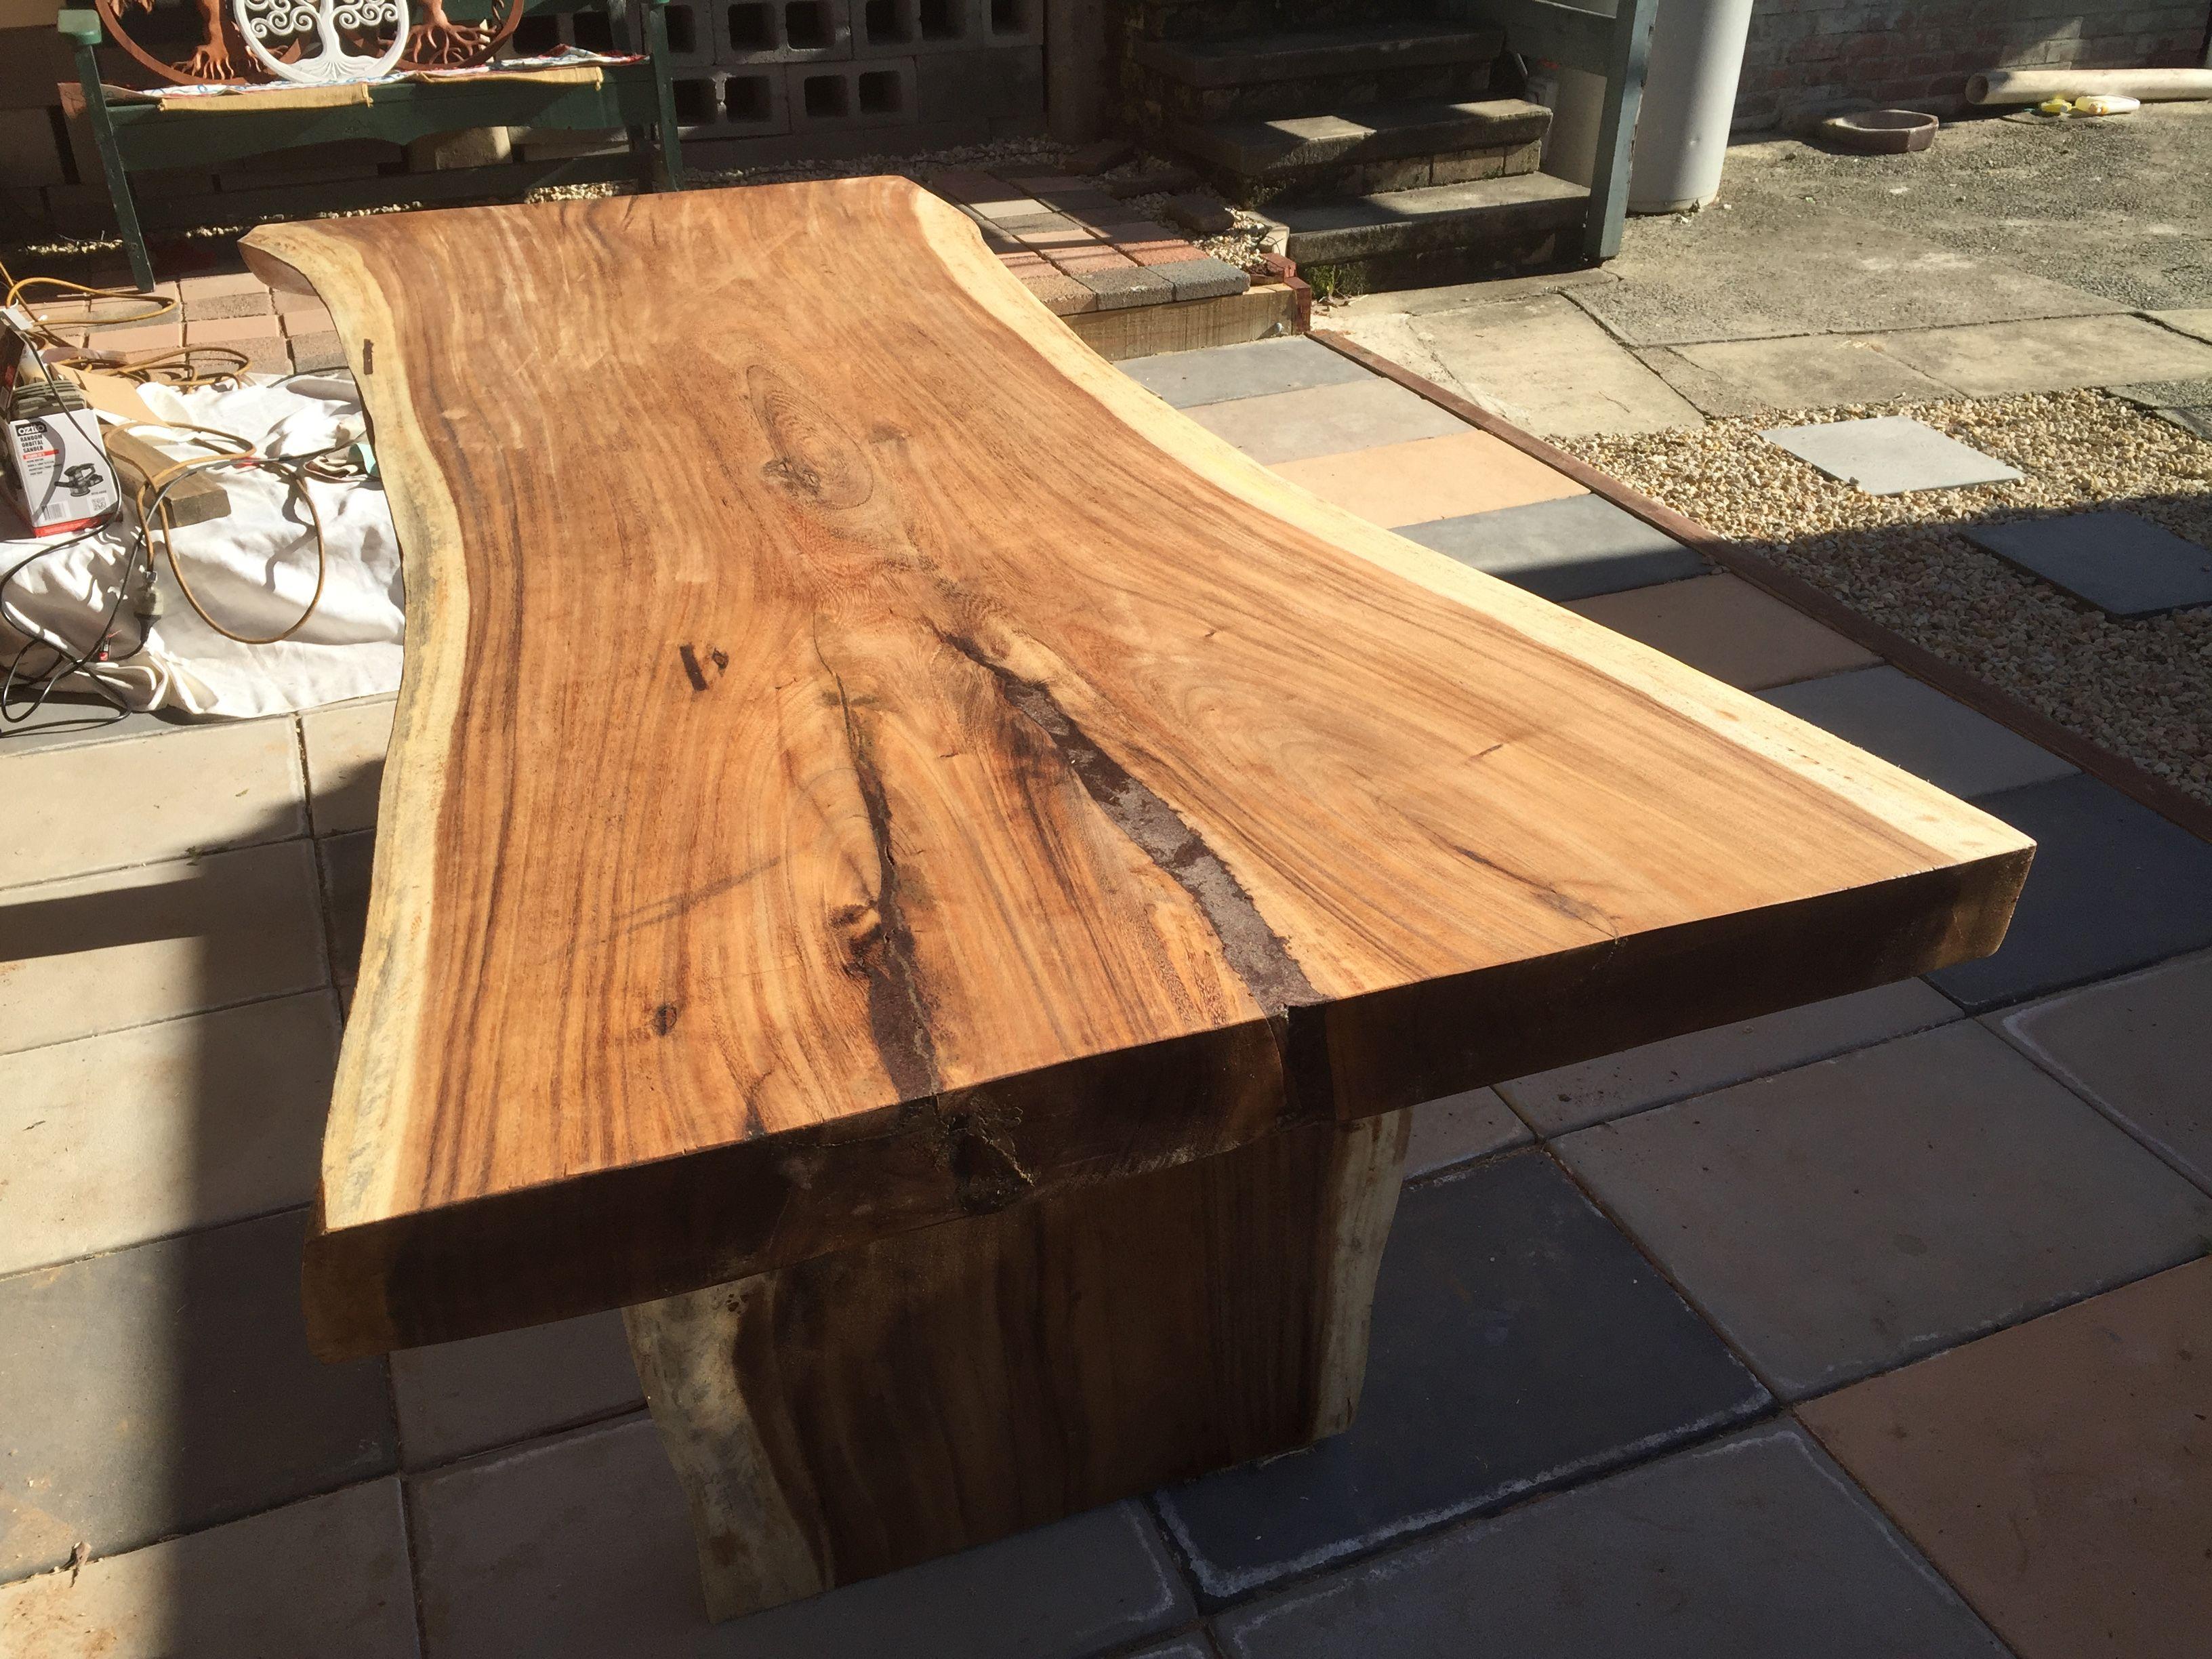 timber slab table suar wood timber slab in 2019 slab table rh pinterest com